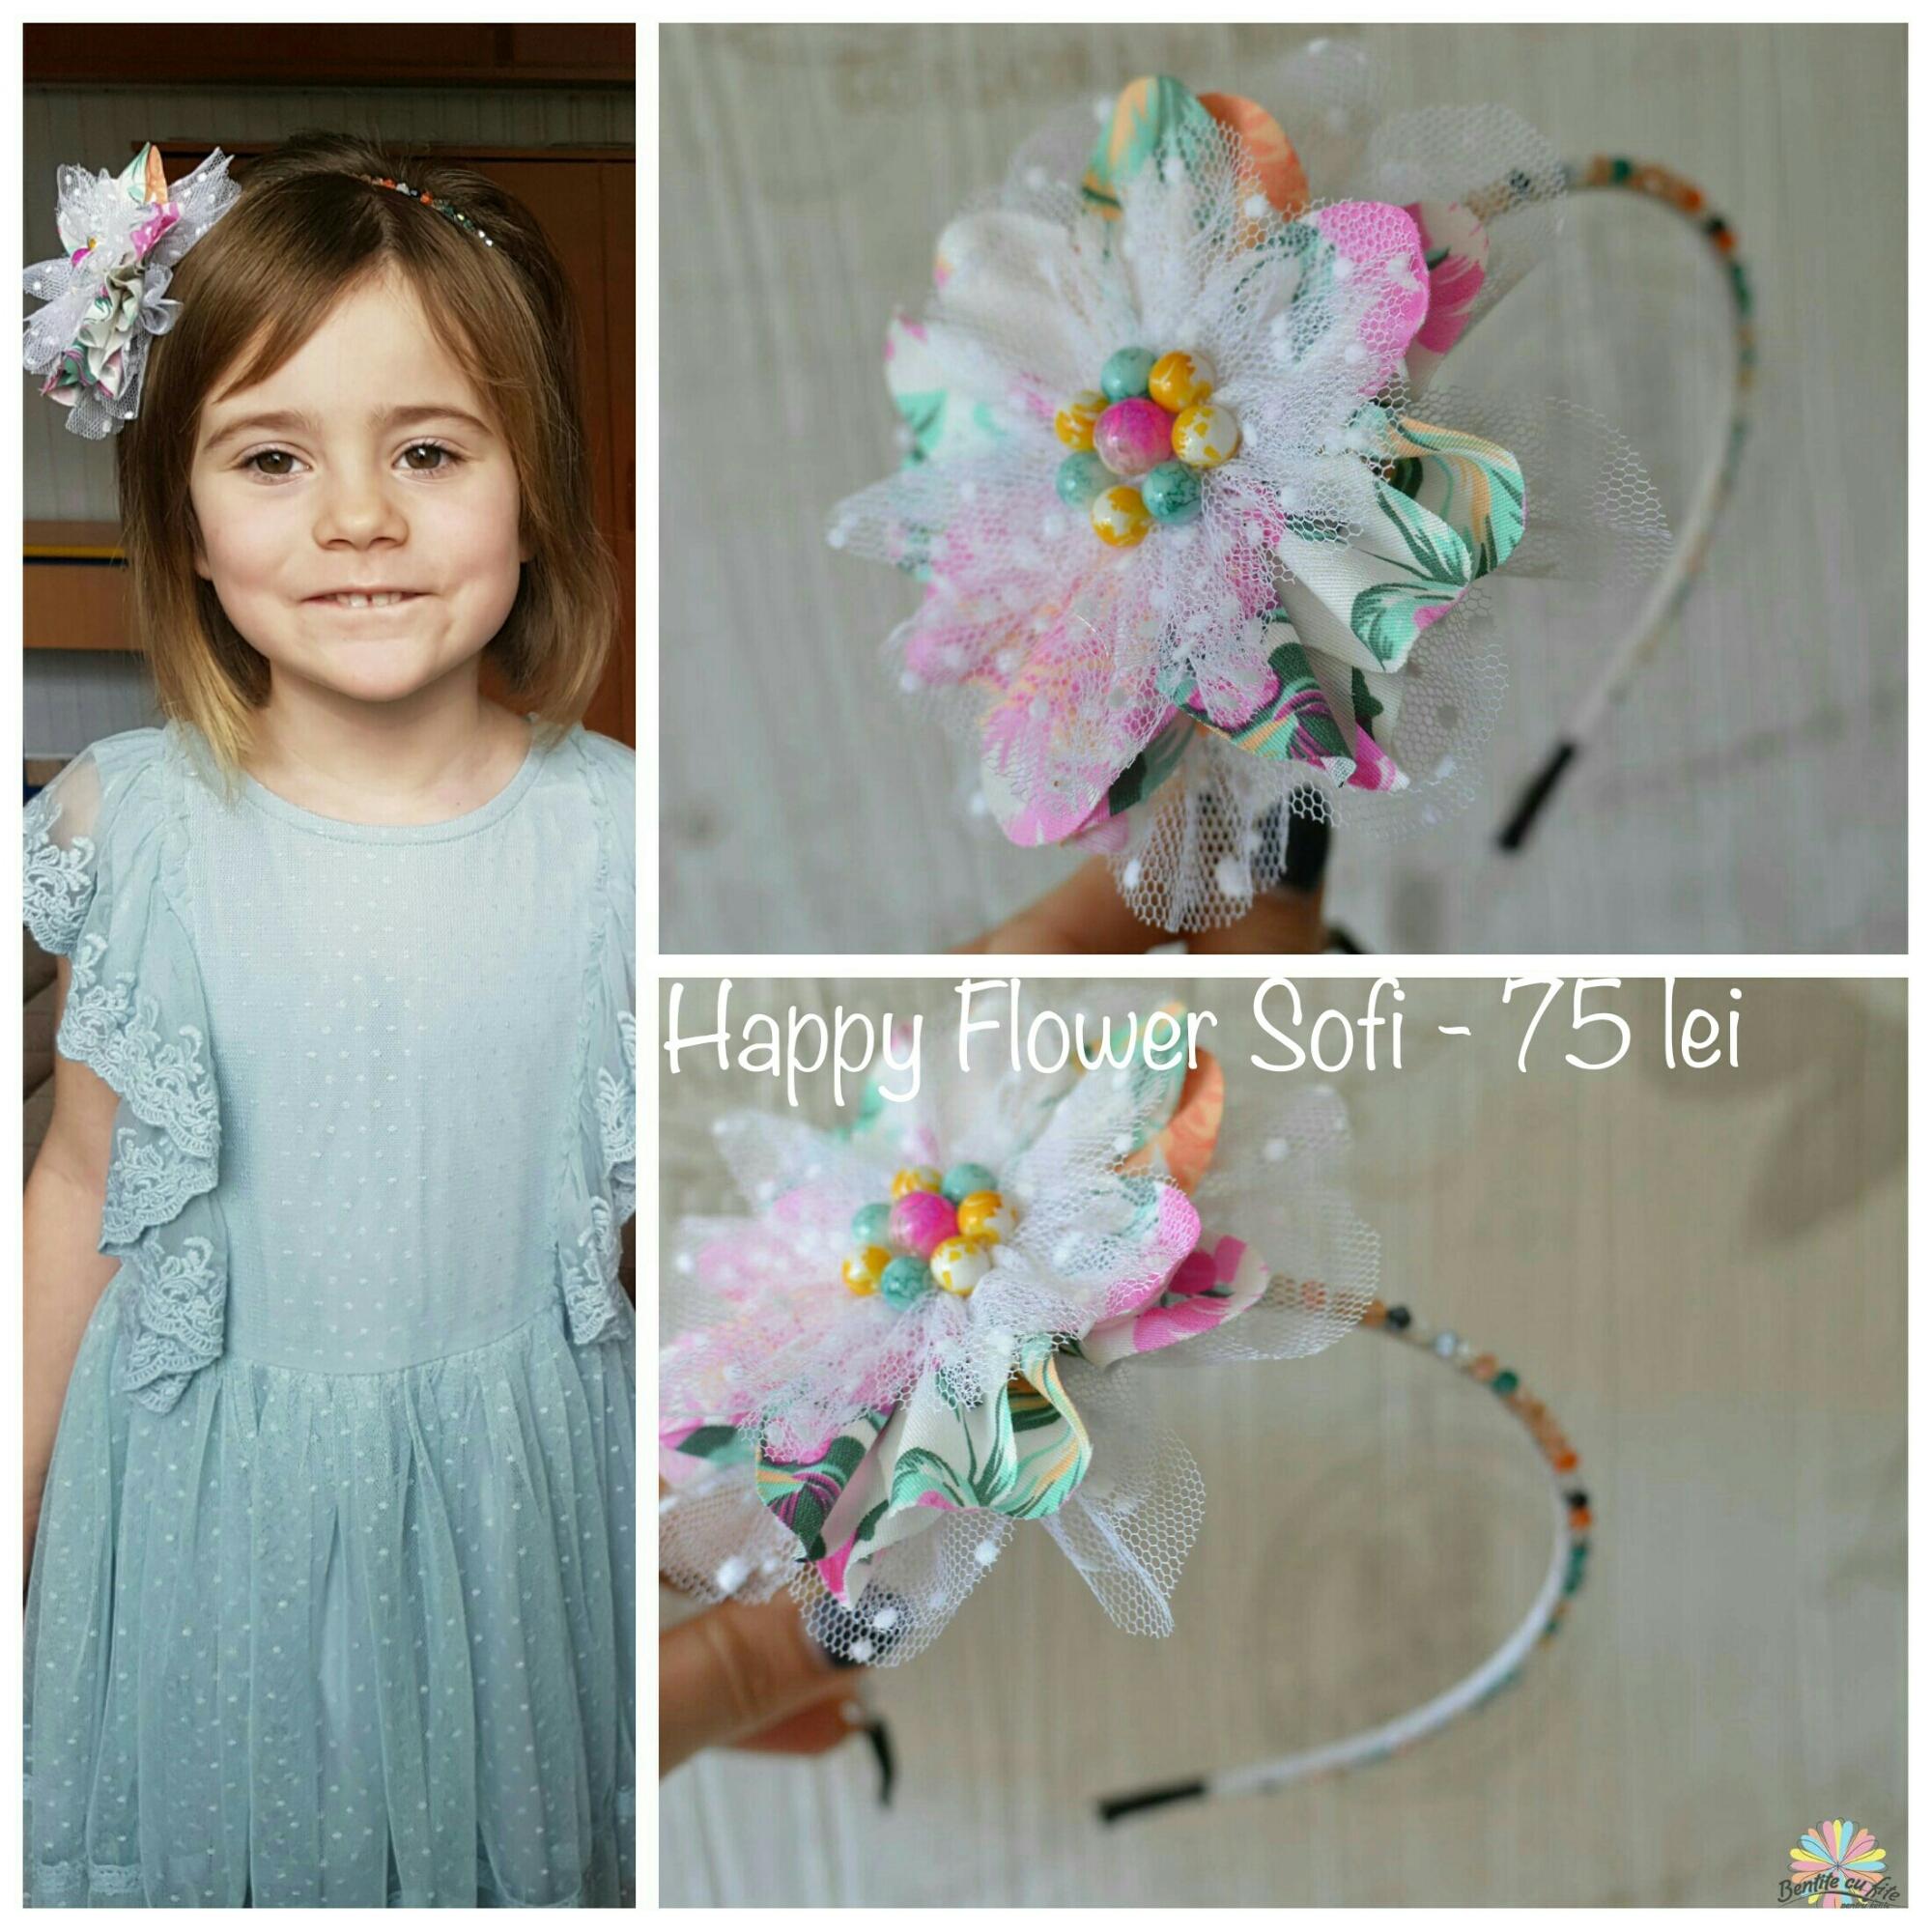 Happy Flower Sofi